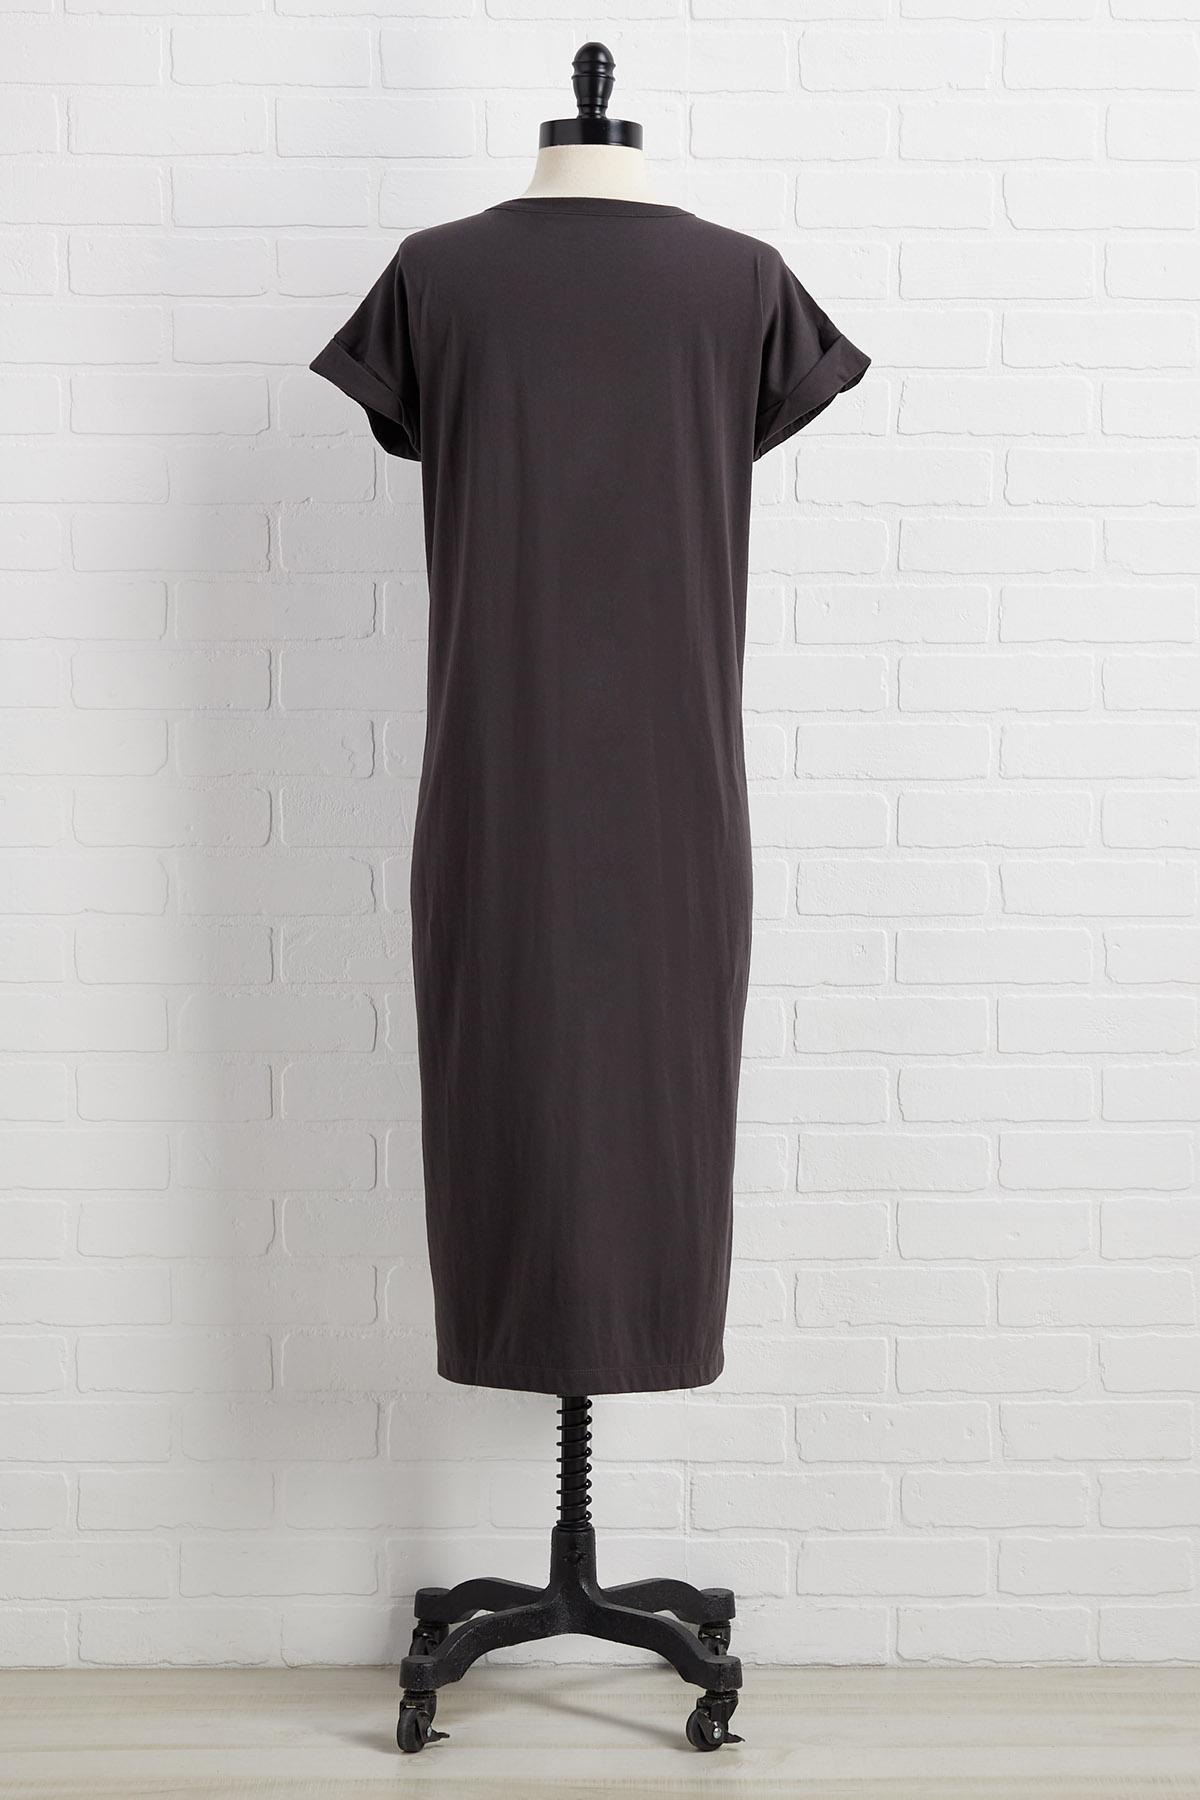 Def Leppard Graphic Dress